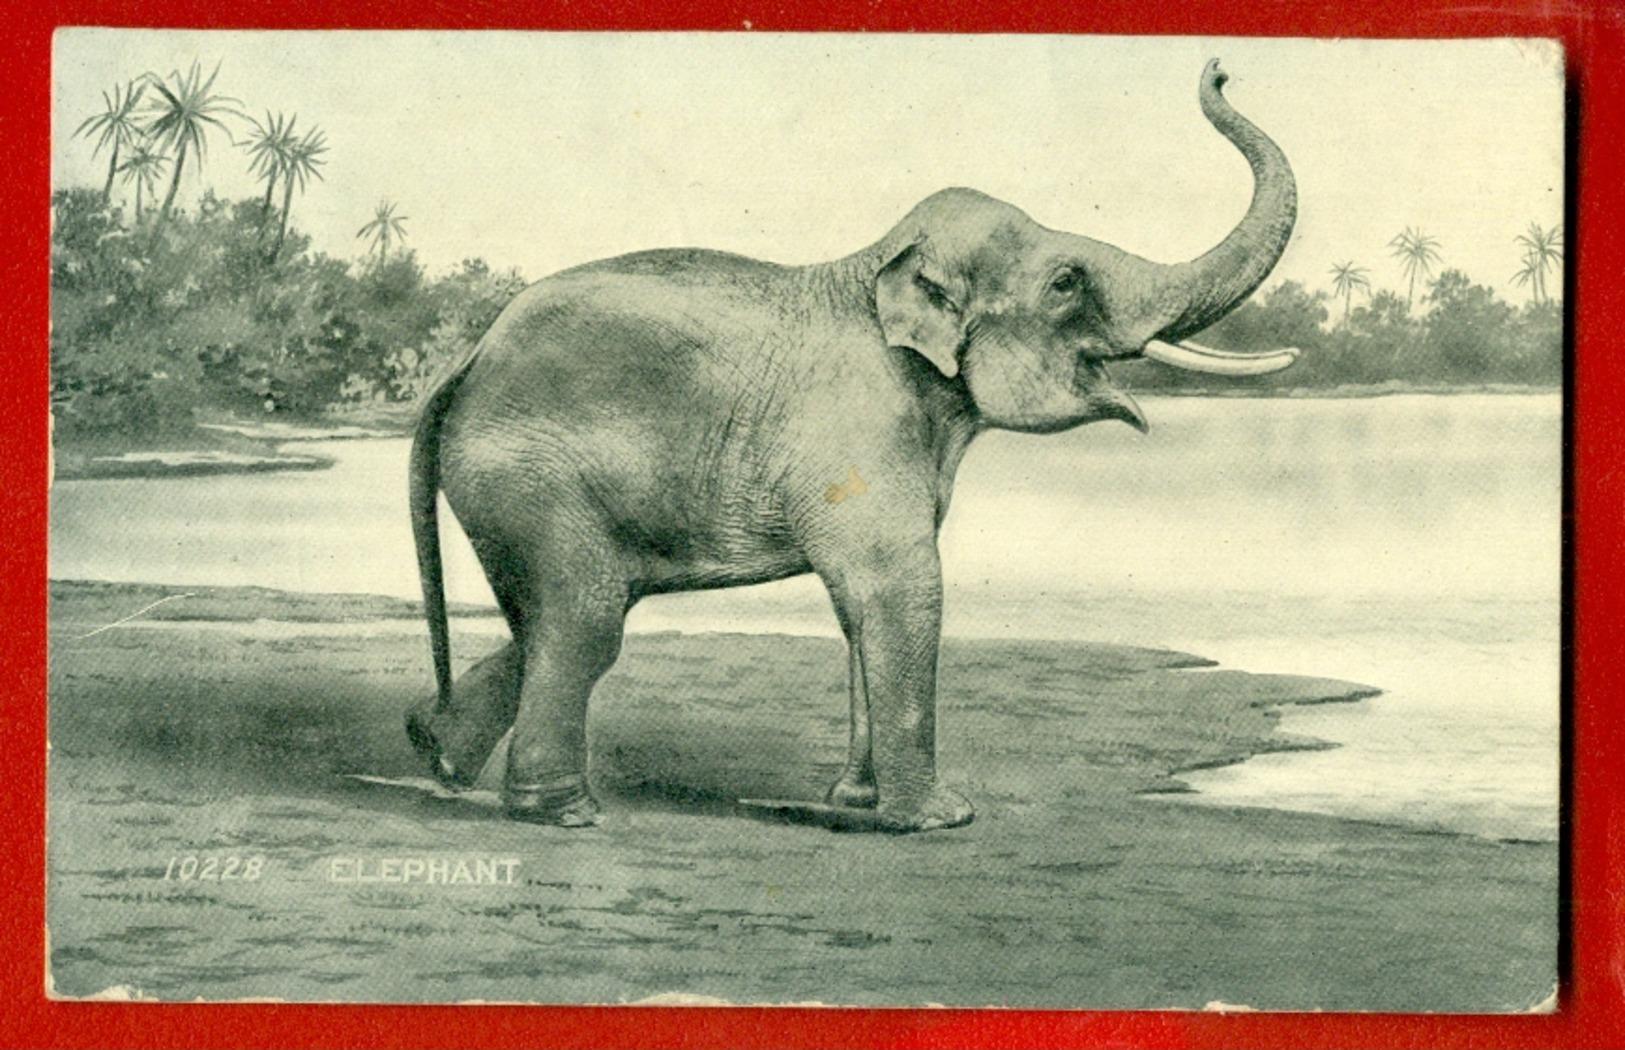 ELEPHANT VINTAGE POSTCARD USED 663 - Elefanten